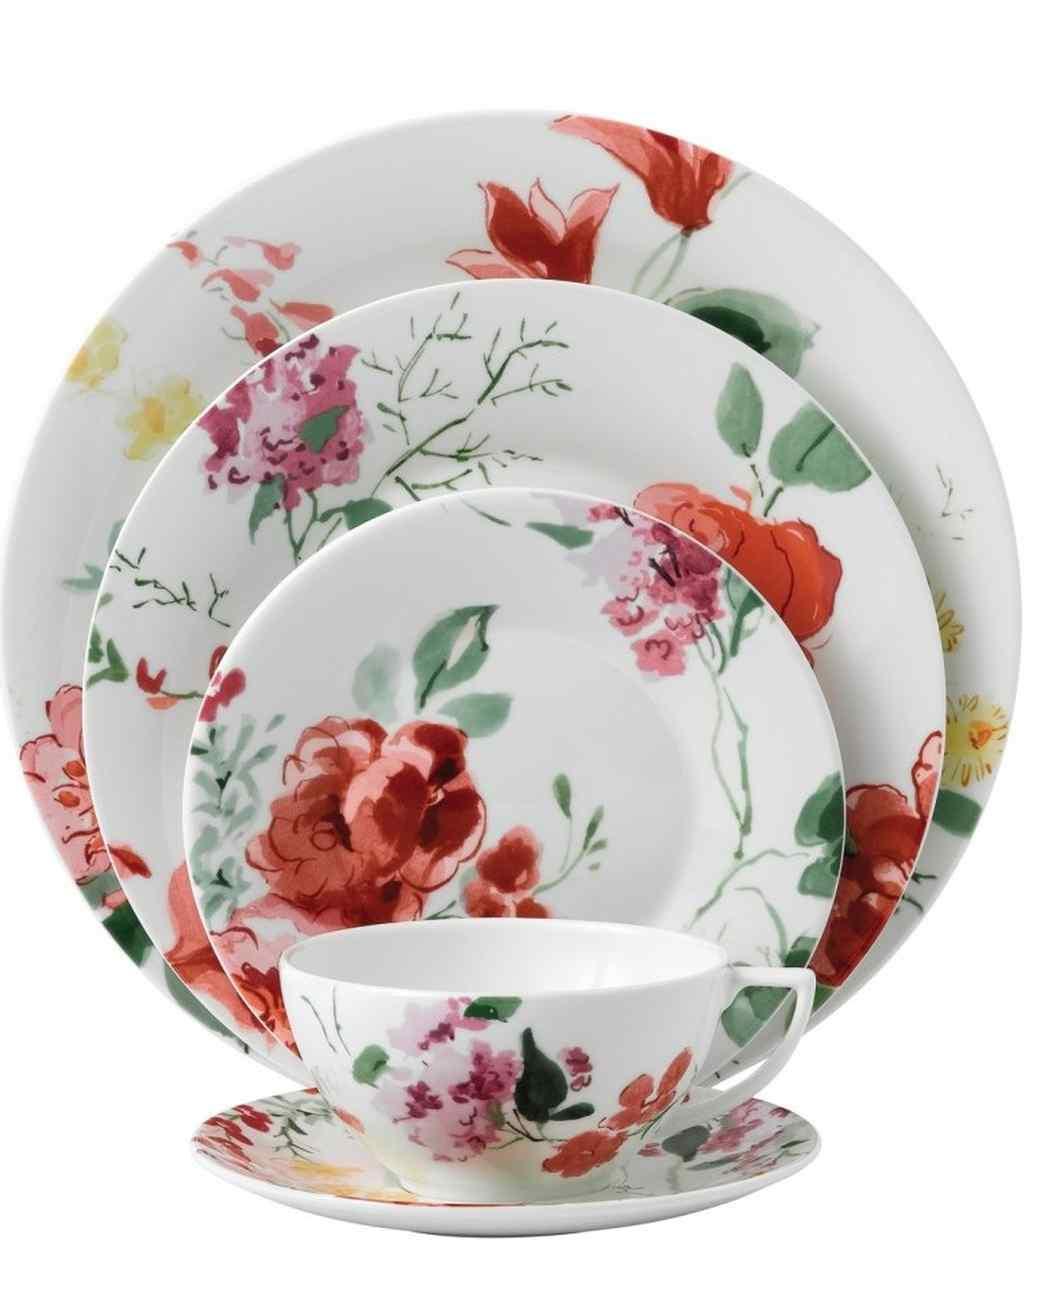 Jasper Conran floral plates